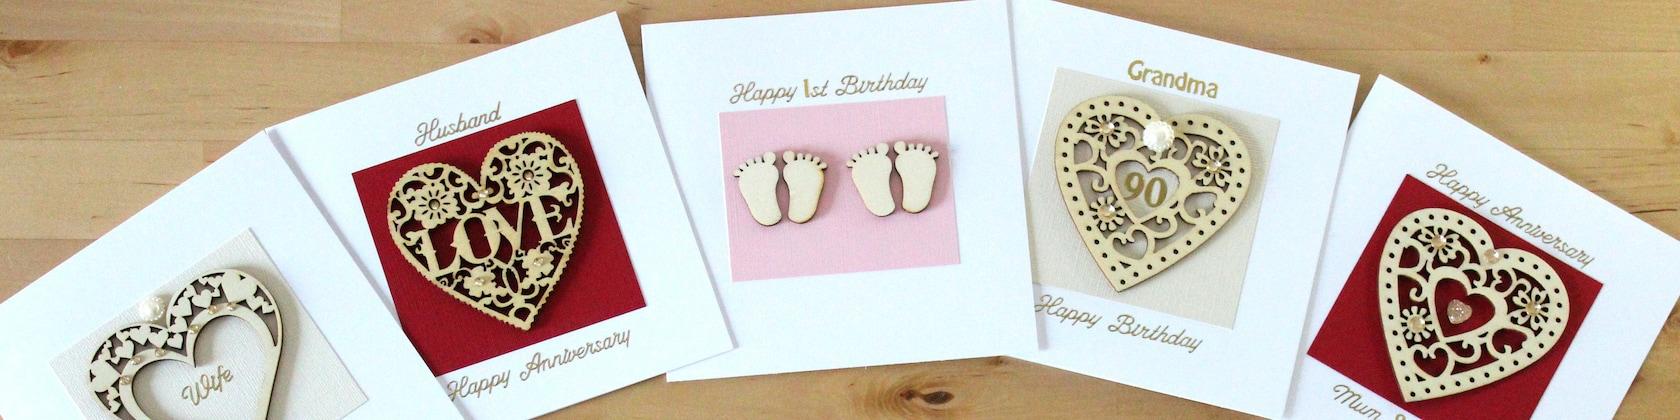 Greeting Cards Unique & Personalised von FyneHandmadeCards auf Etsy